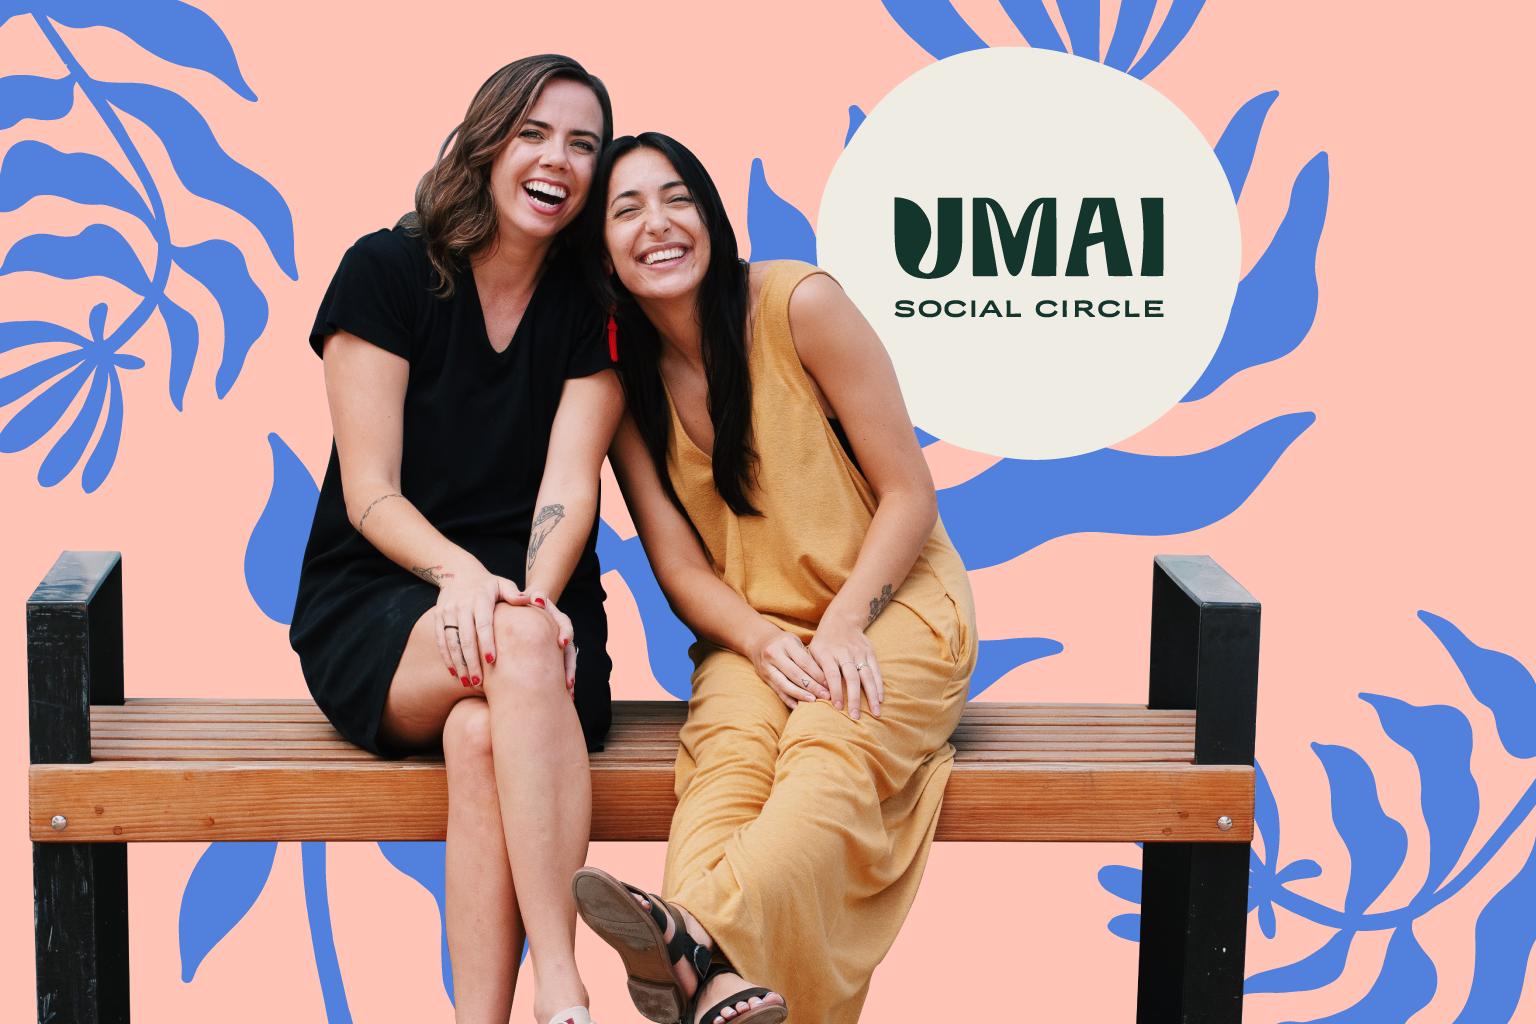 UMAI social circle cpg podcast